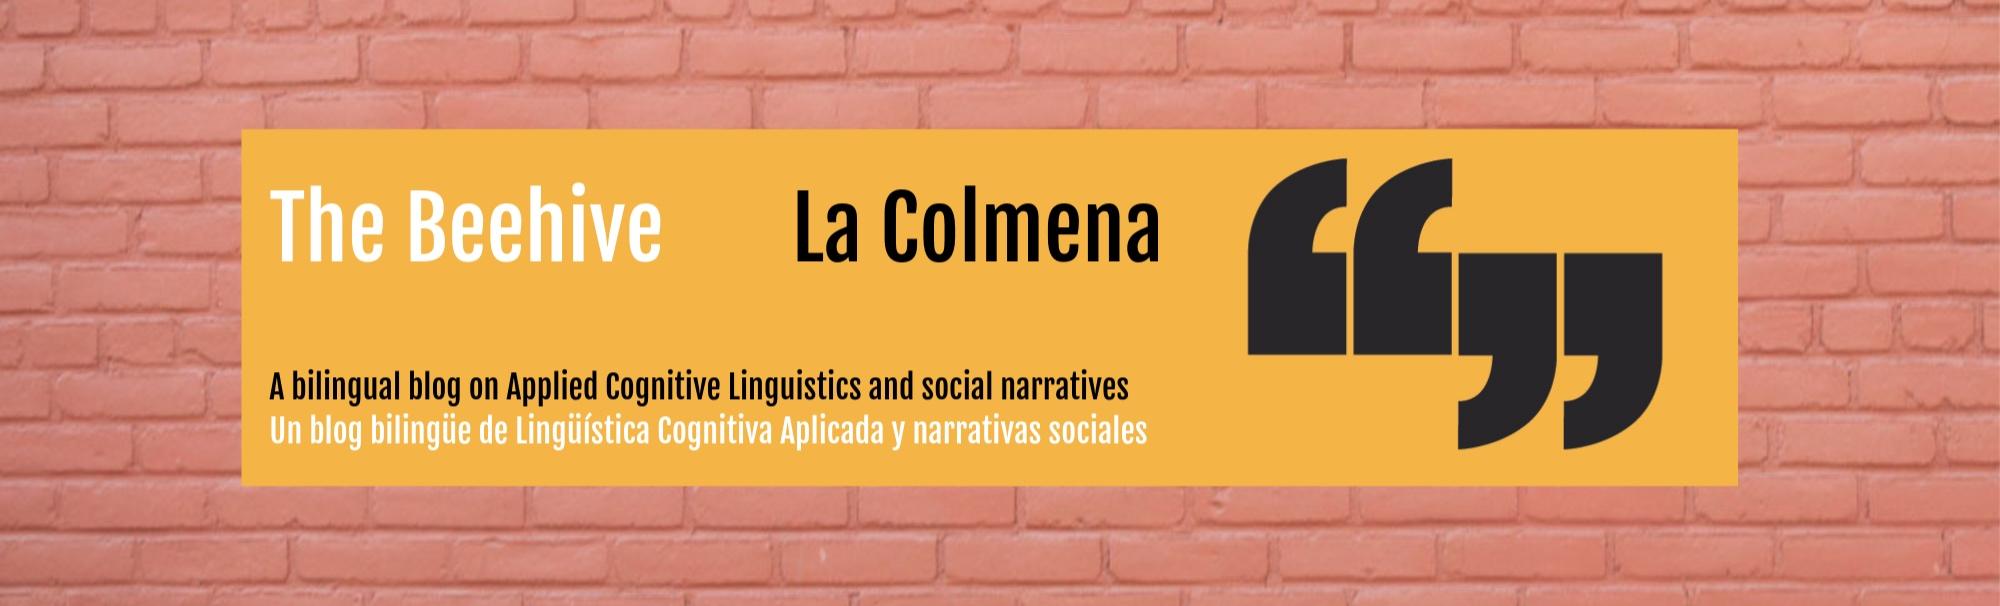 The Beehive La Colmena Blog